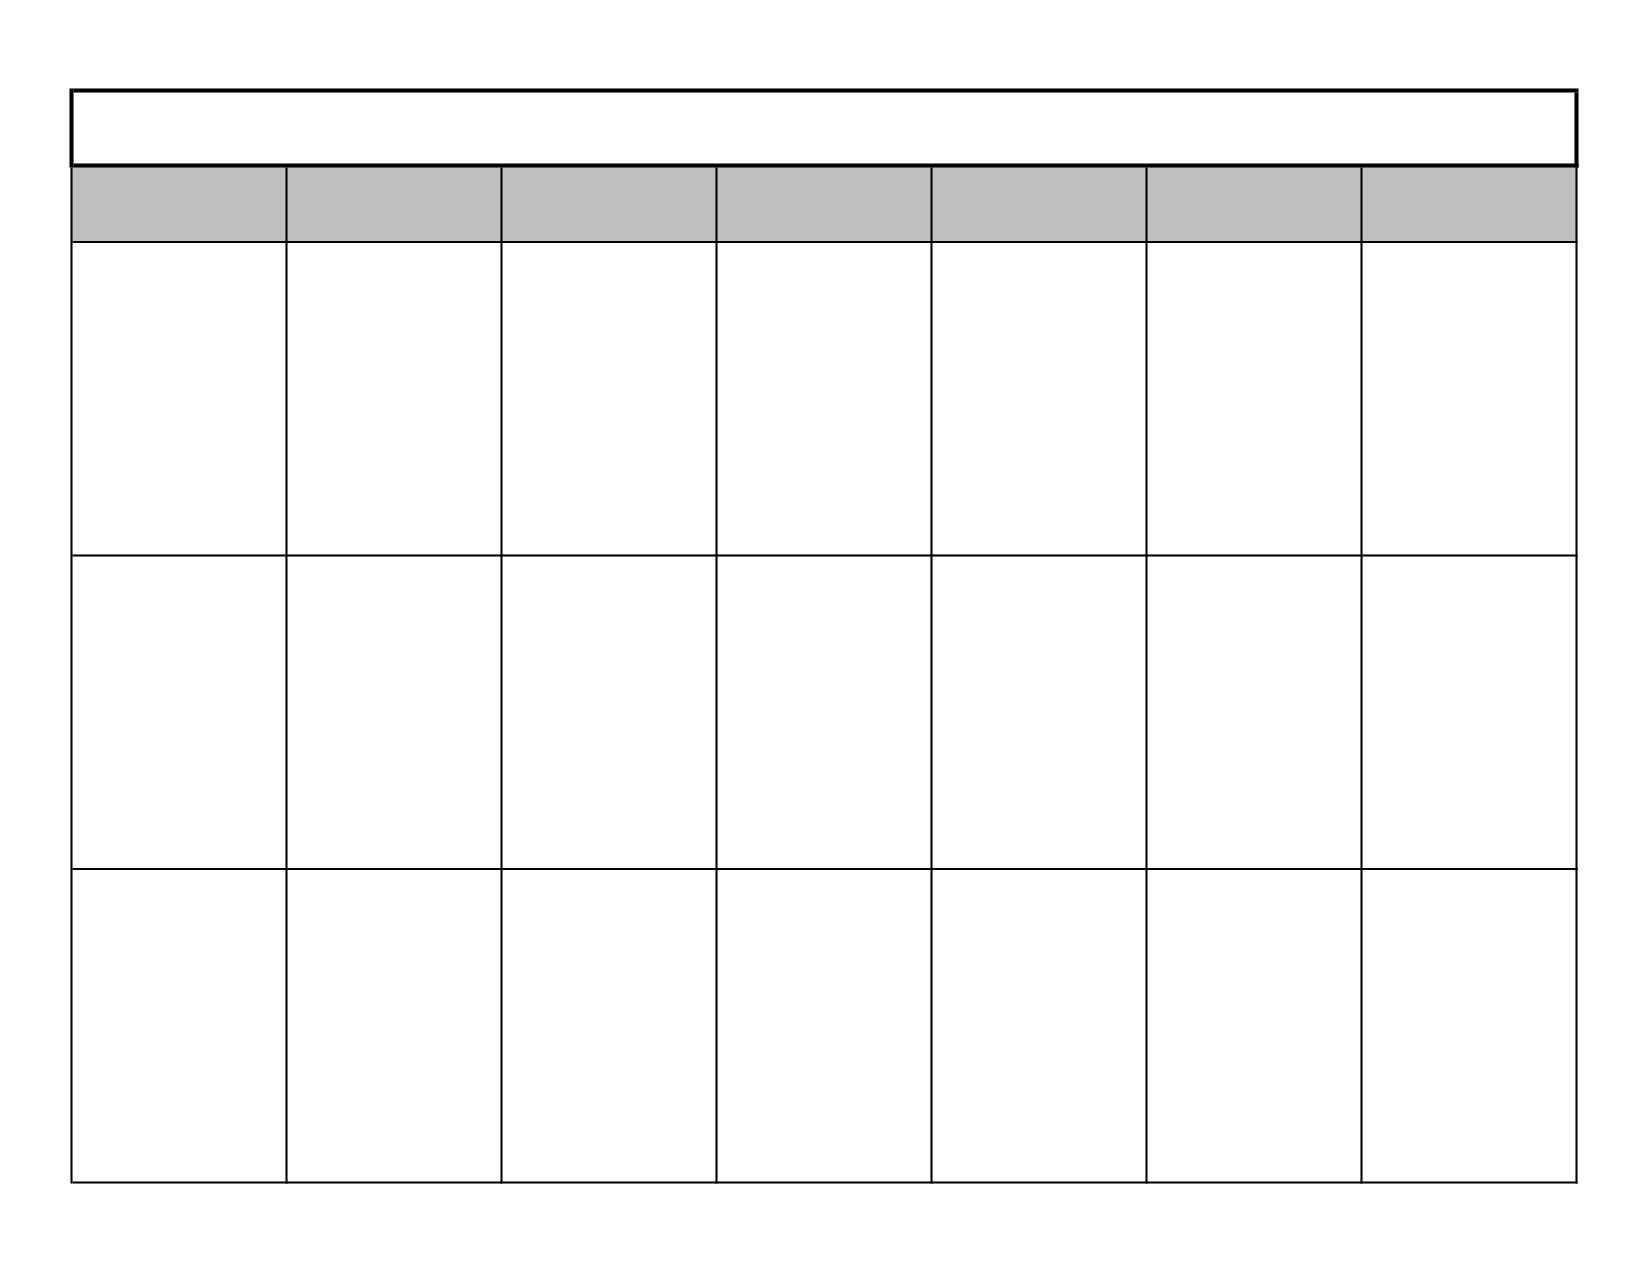 3 Week Calendar  Grude.interpretomics.co Make It | Blank for 2 Week Blank Calendar